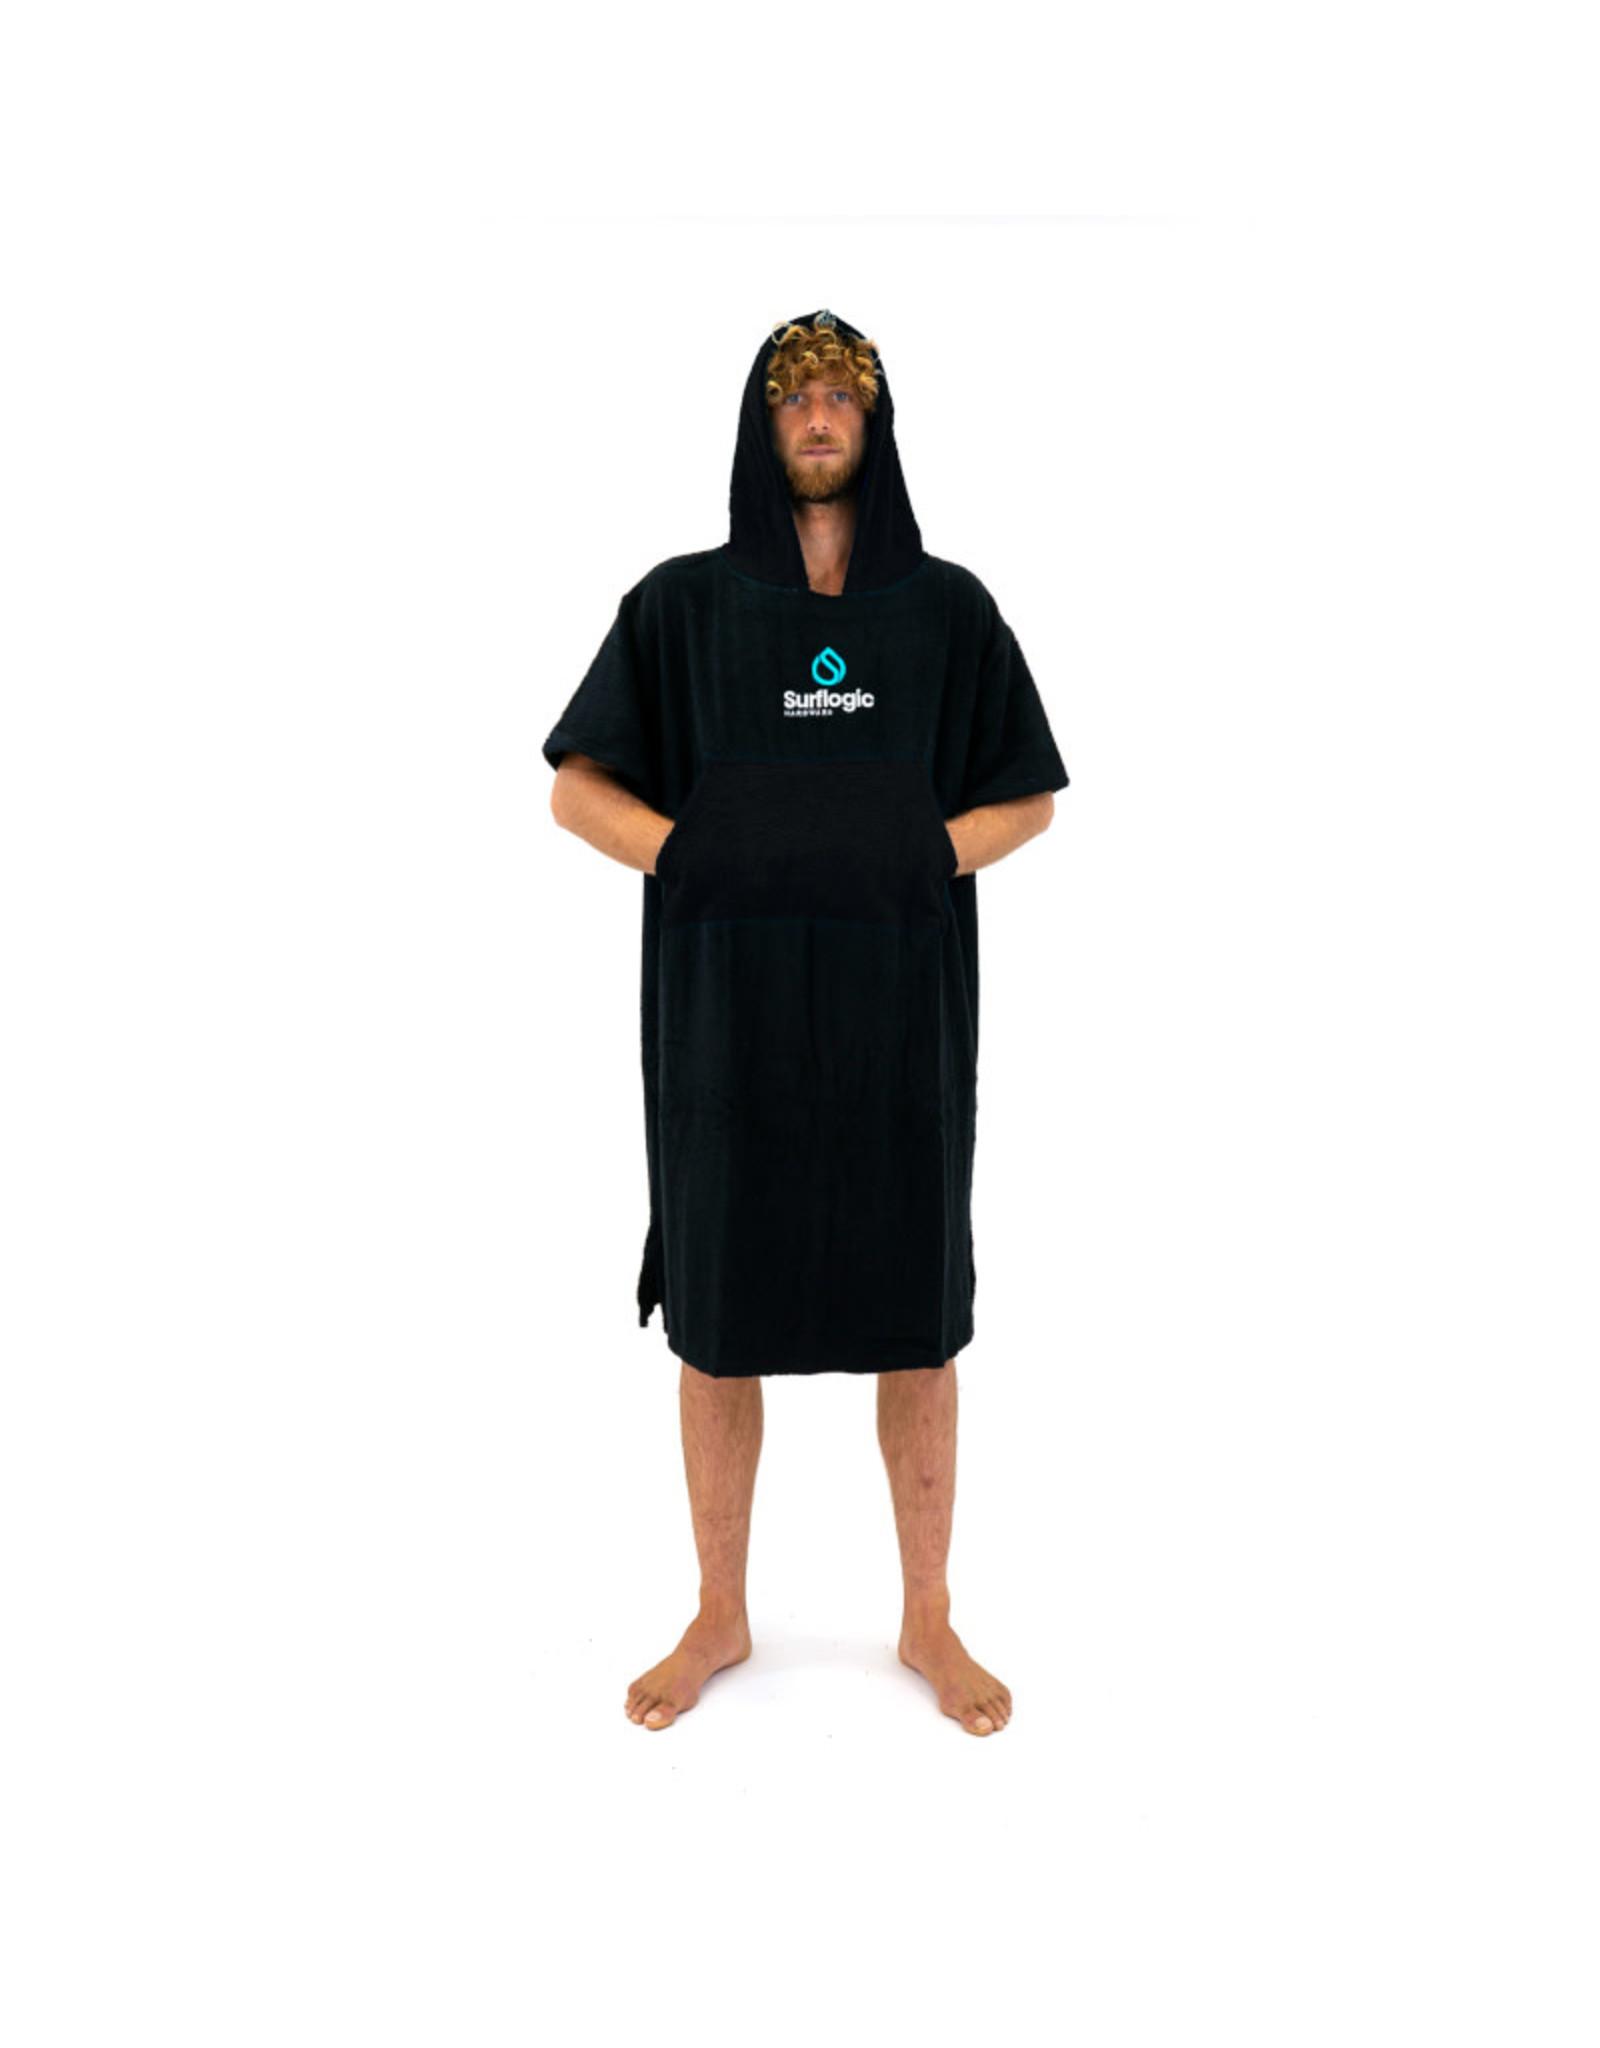 Surflogic Surflogic Poncho Black